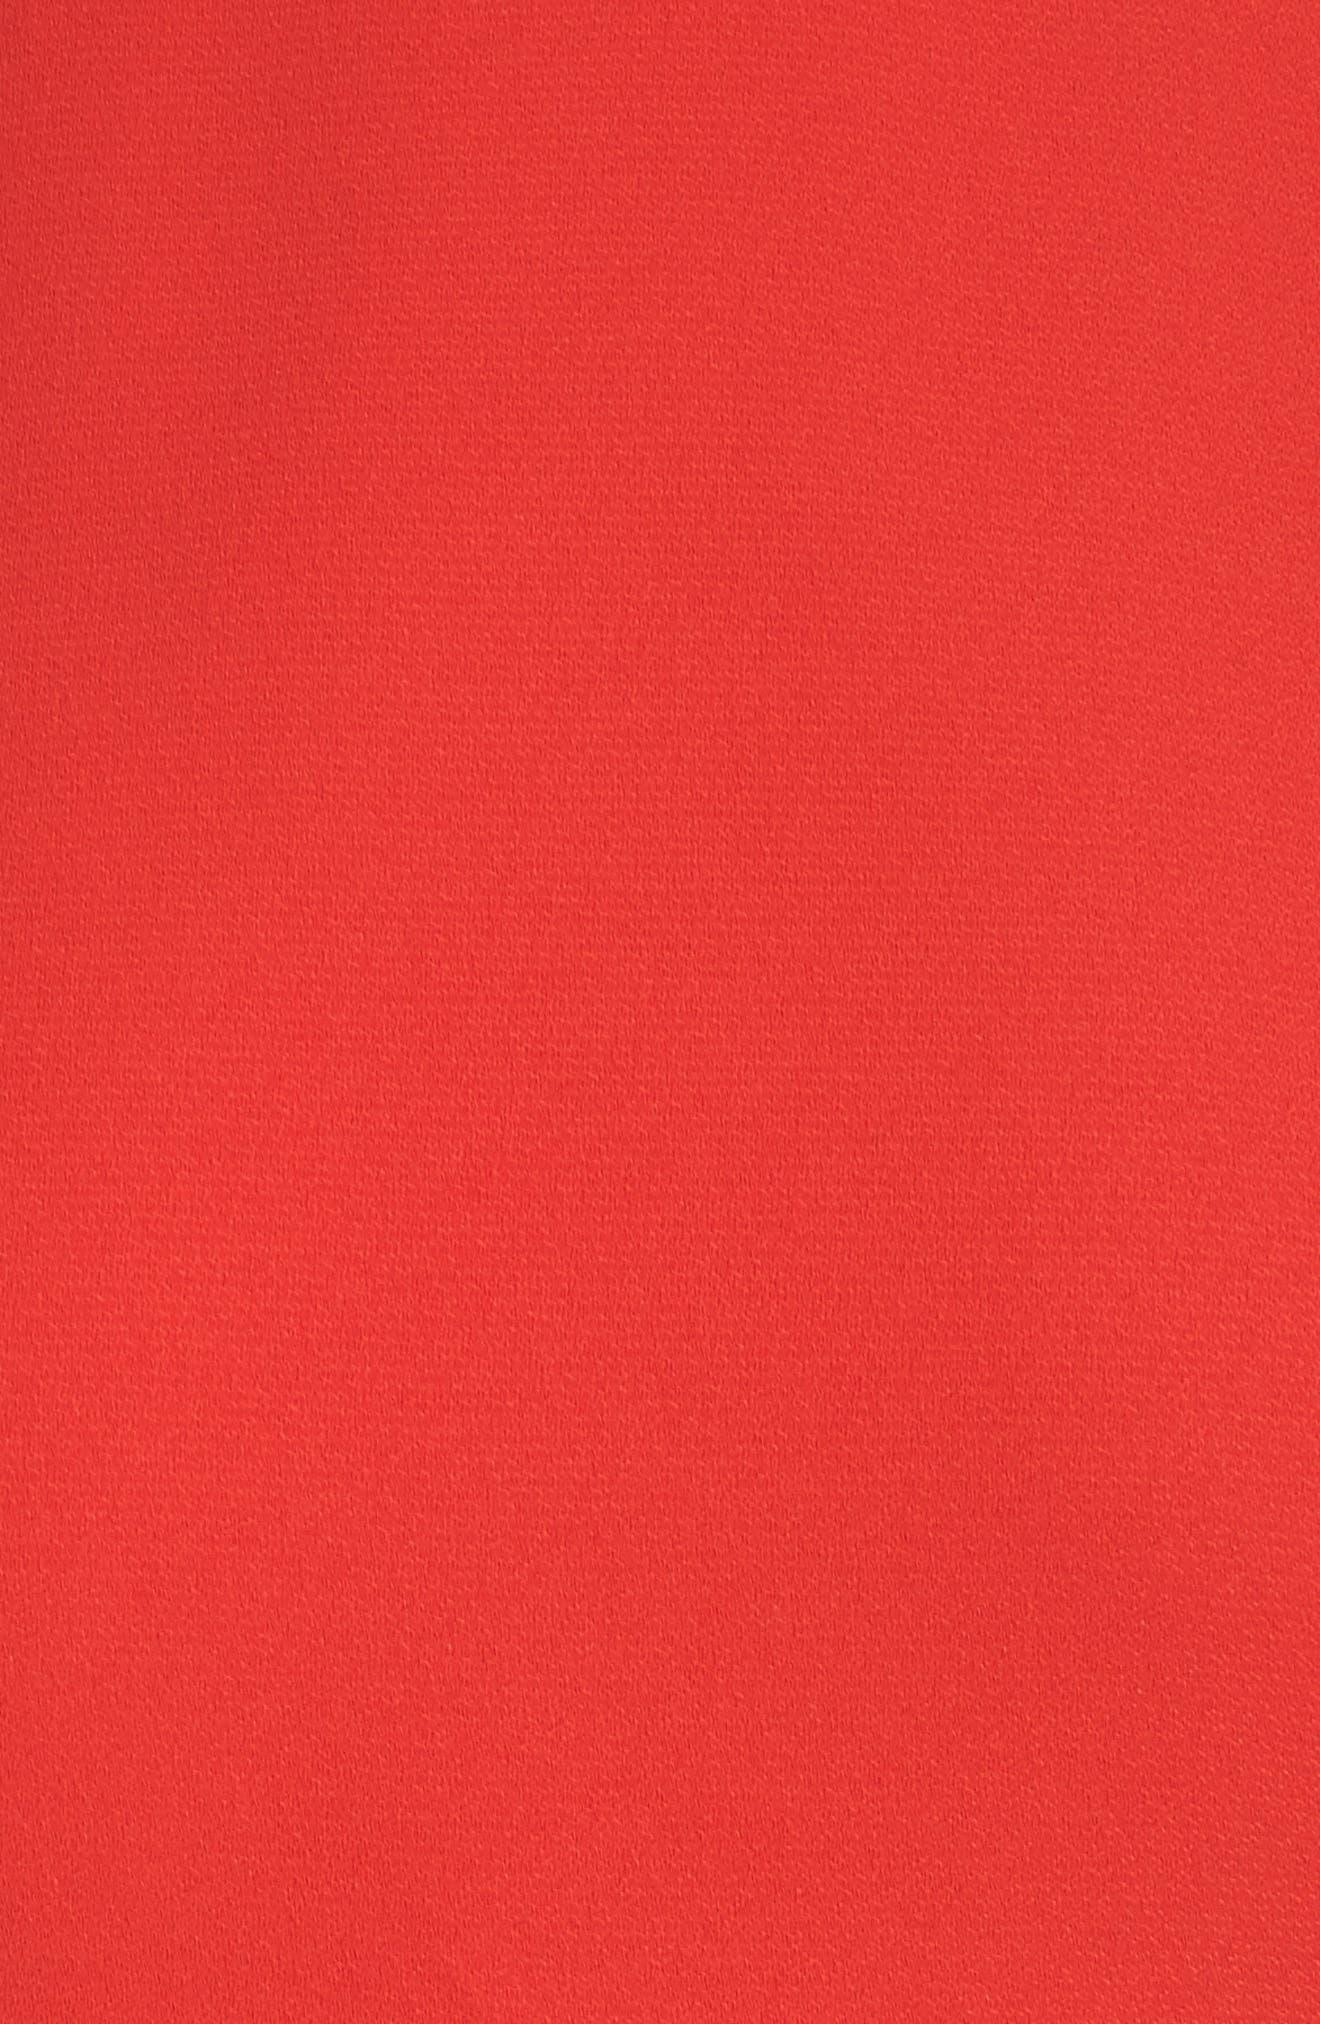 Ruffle Edge Sheath Dress,                             Alternate thumbnail 5, color,                             950